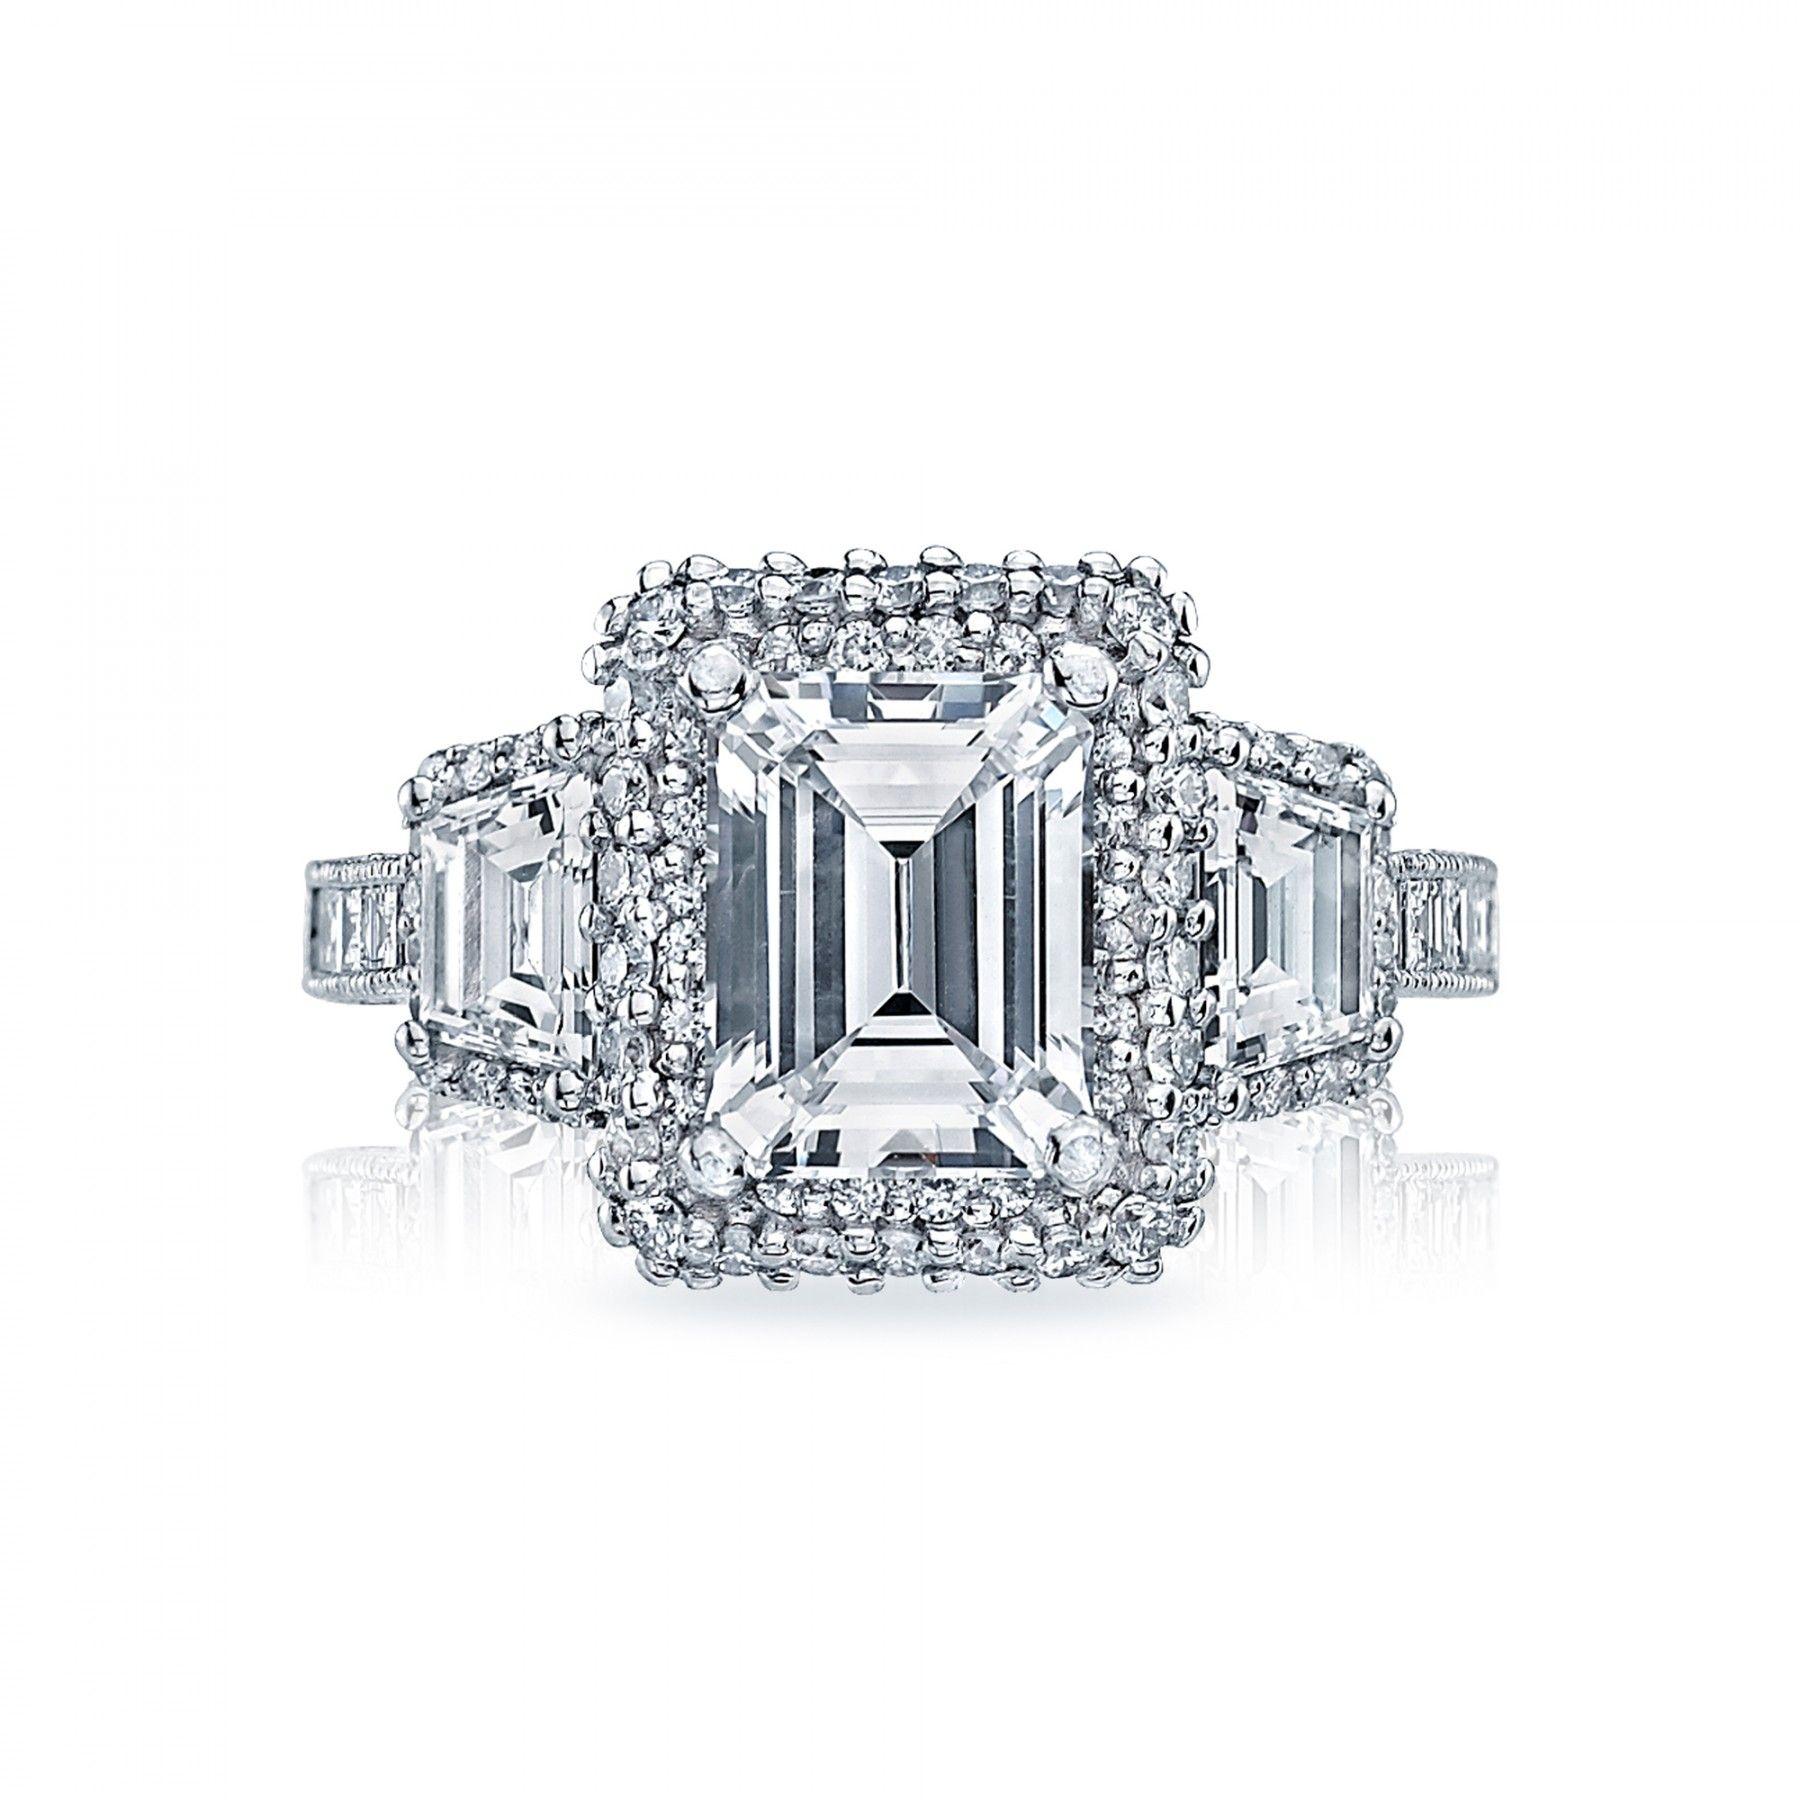 Style# HT2527EC85X65 - Blooming Beauties - Tacori.com | $17,450.00 in Platinum